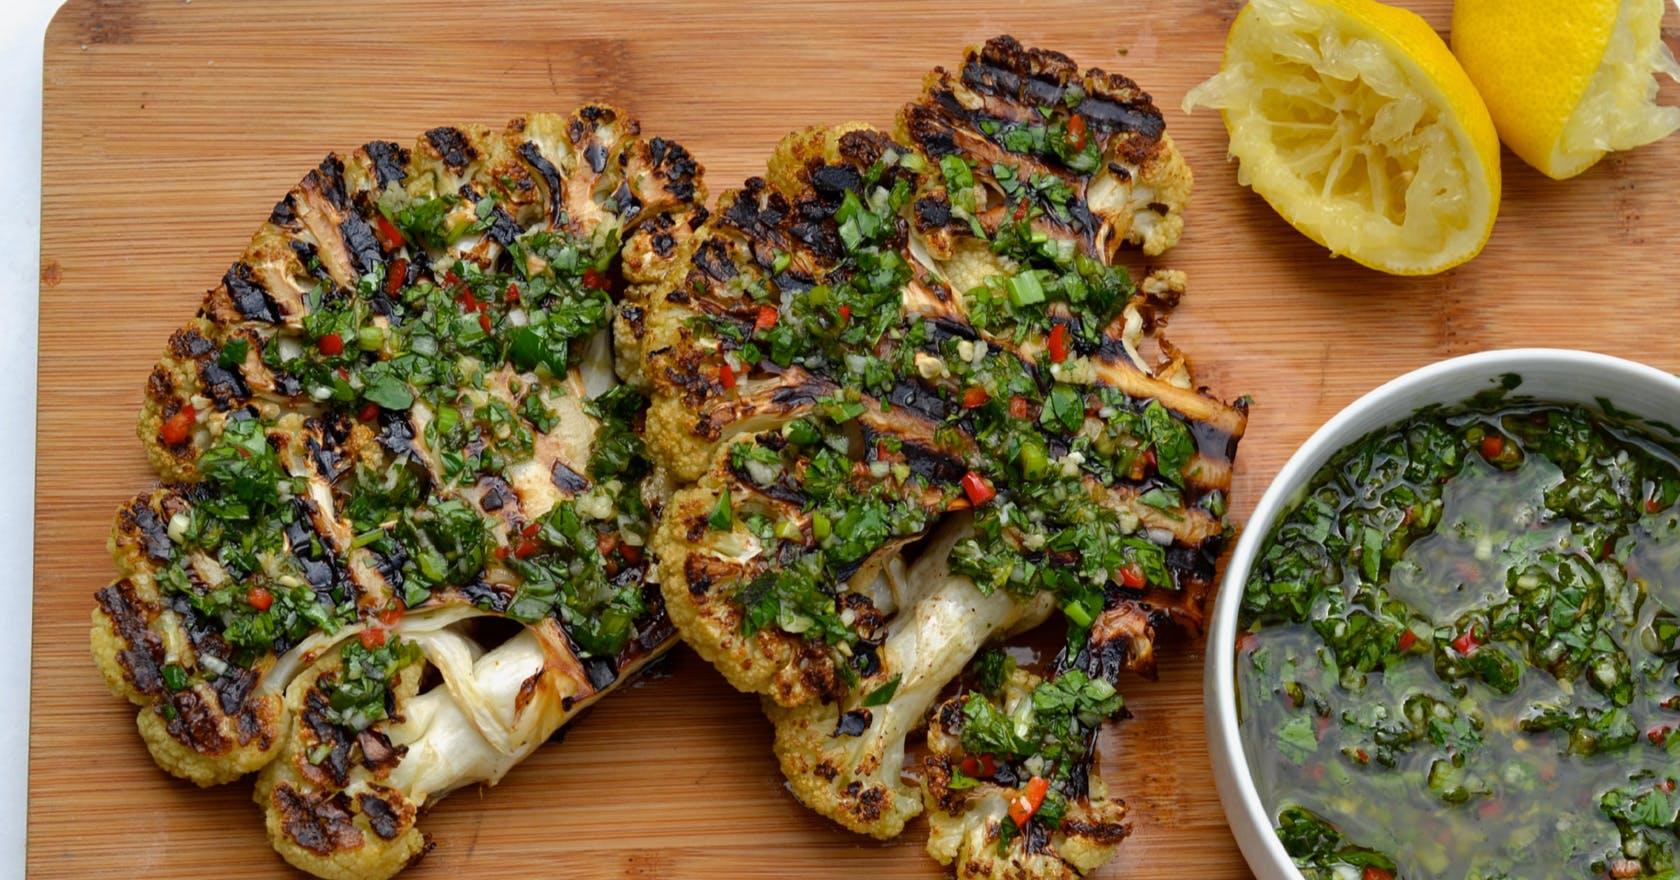 Liven up your BBQ with this vegan cauliflower steak